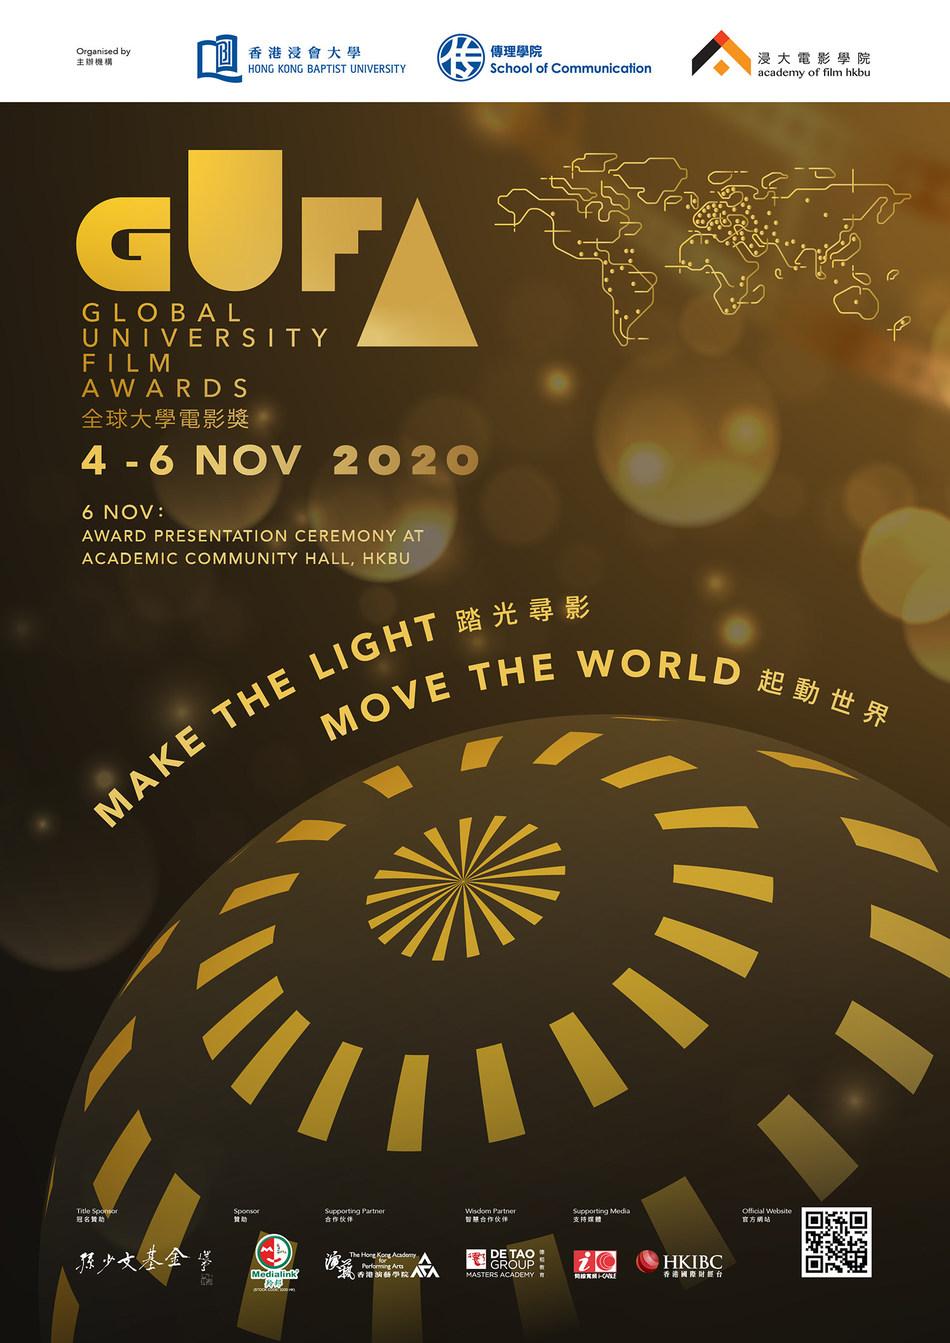 Poster of the Global University Film Awards 2020